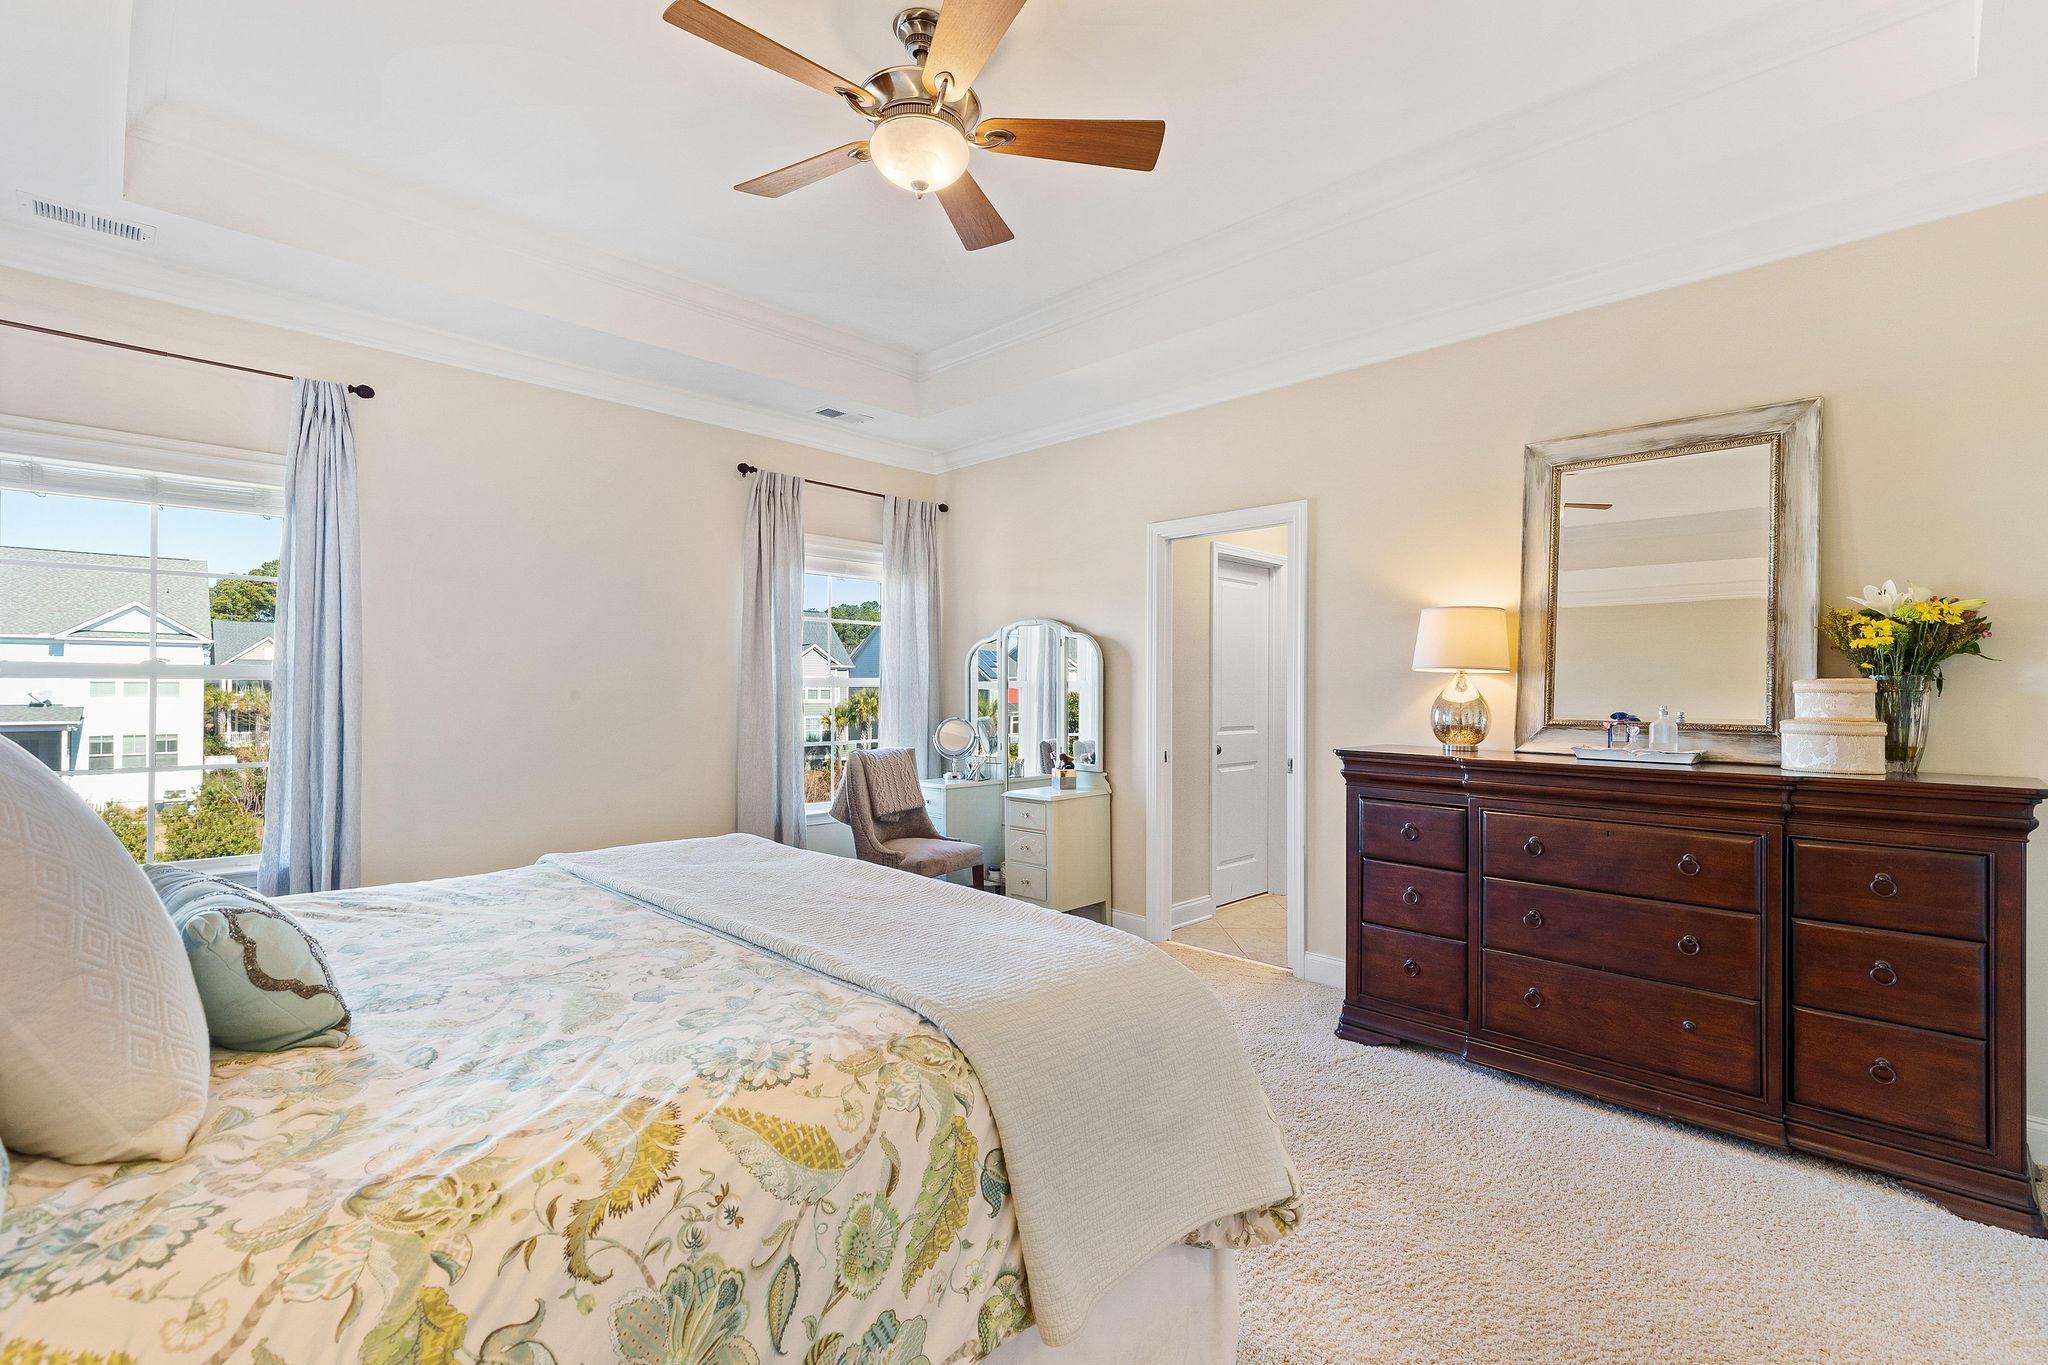 Dunes West Homes For Sale - 3212 Hatchway, Mount Pleasant, SC - 6